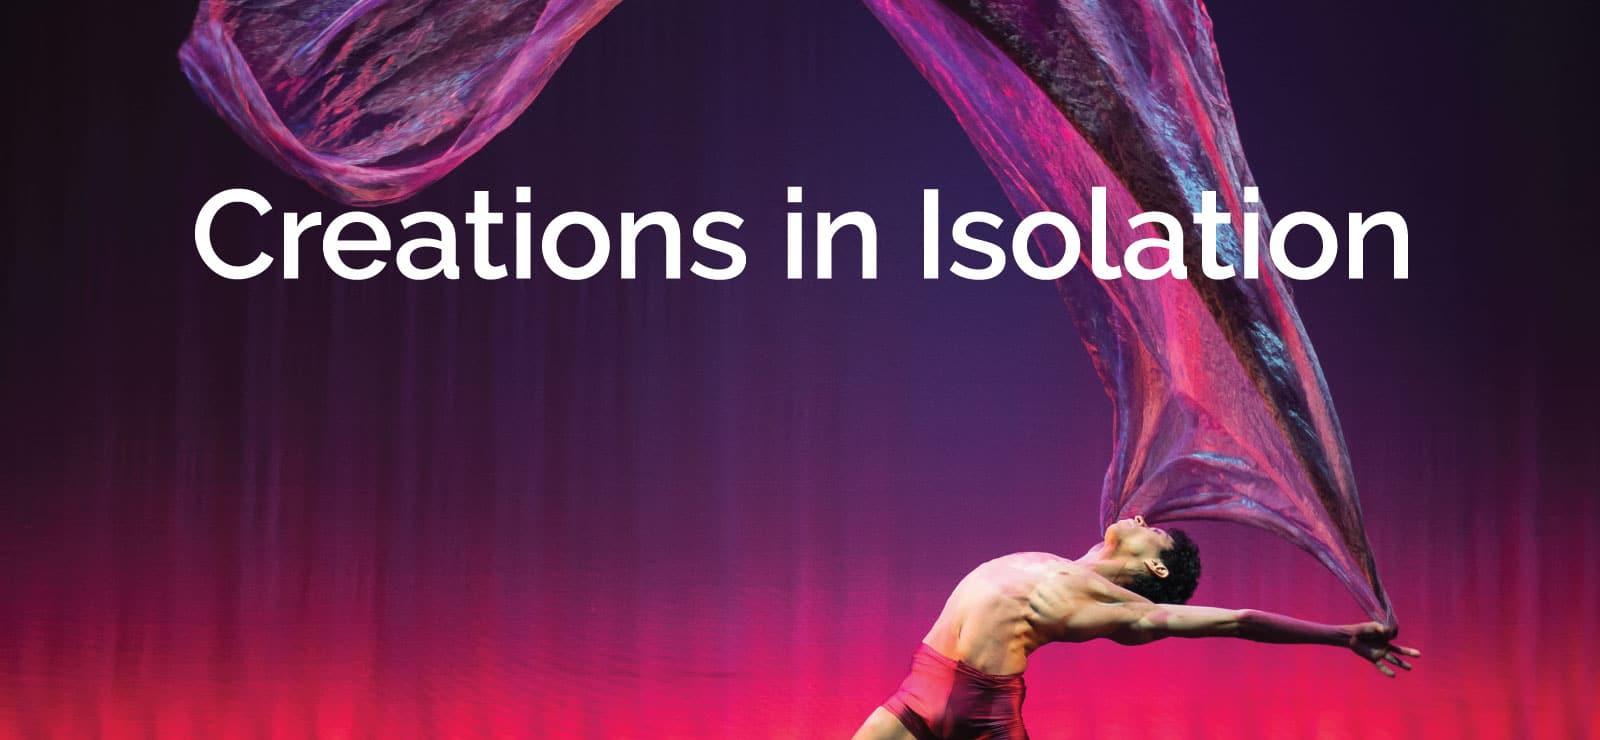 Ballet Jörgen Creations in Isolation Tour